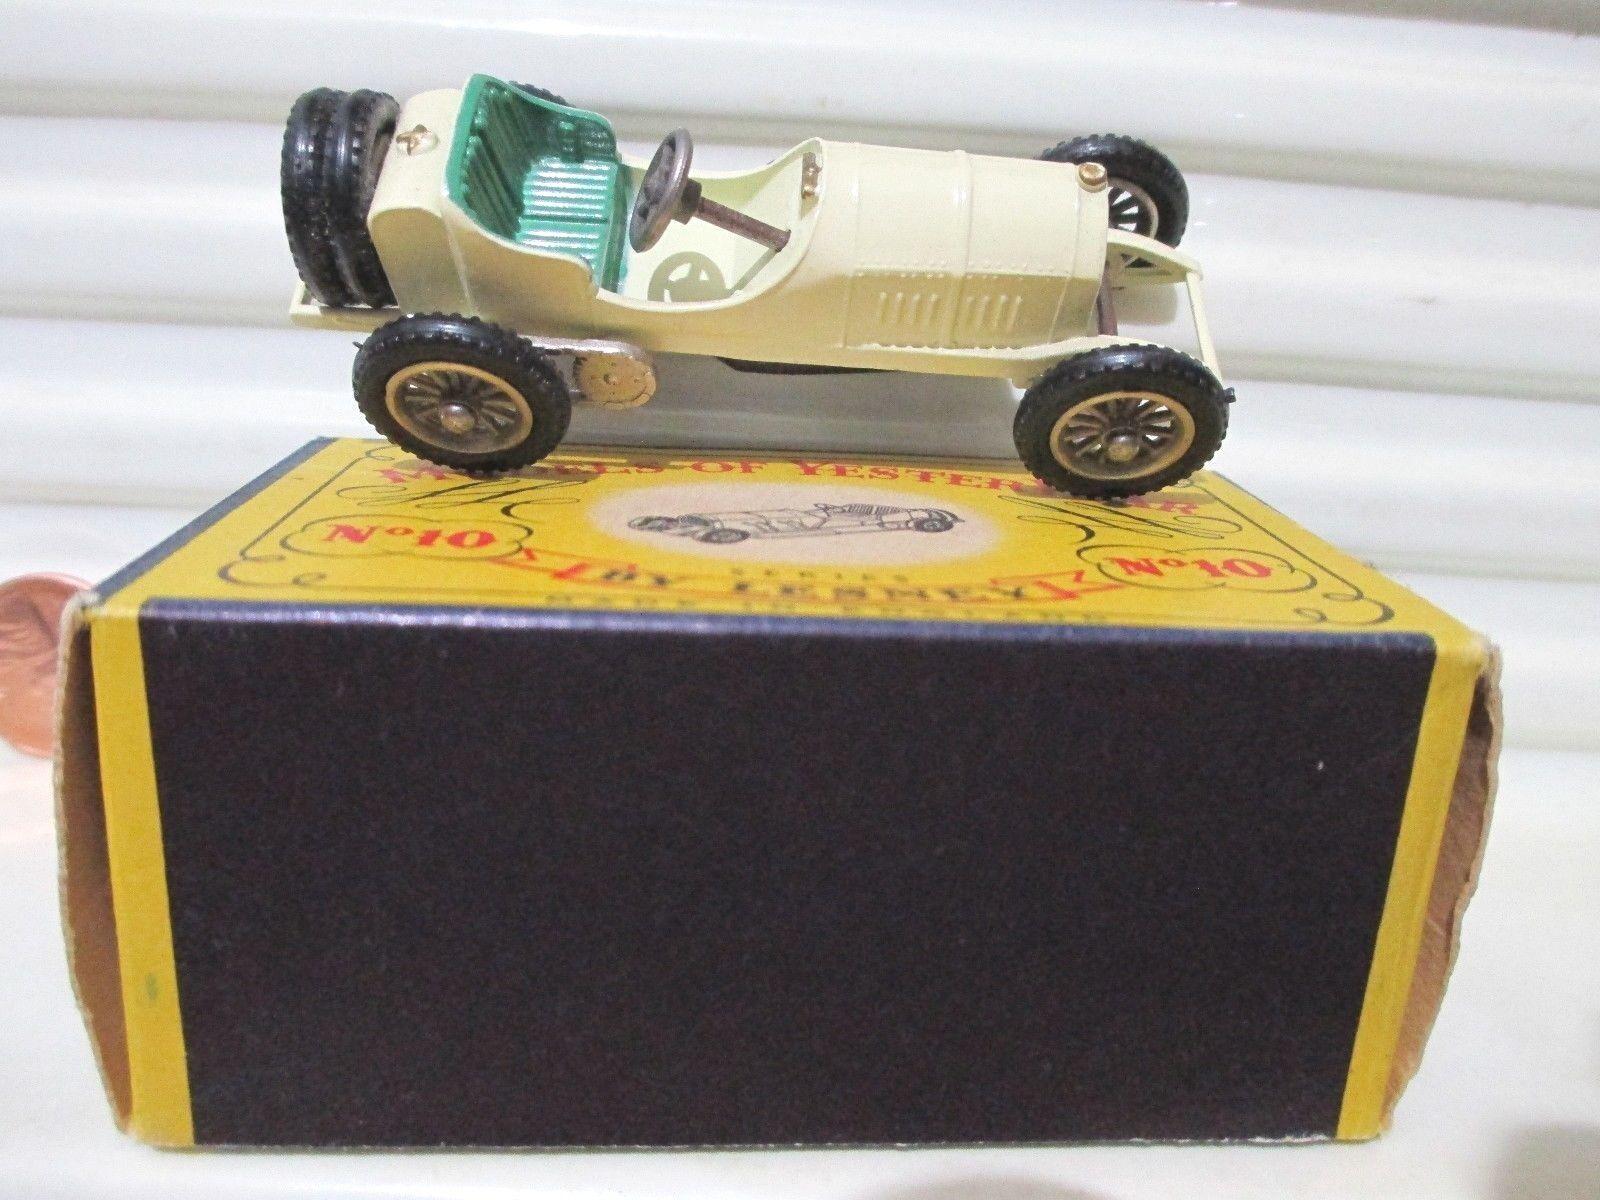 Matchbox 1958 Models of Yesteryear Y10 1908 Cream +LtGrn TYPE 1 SEATS MERCEDES